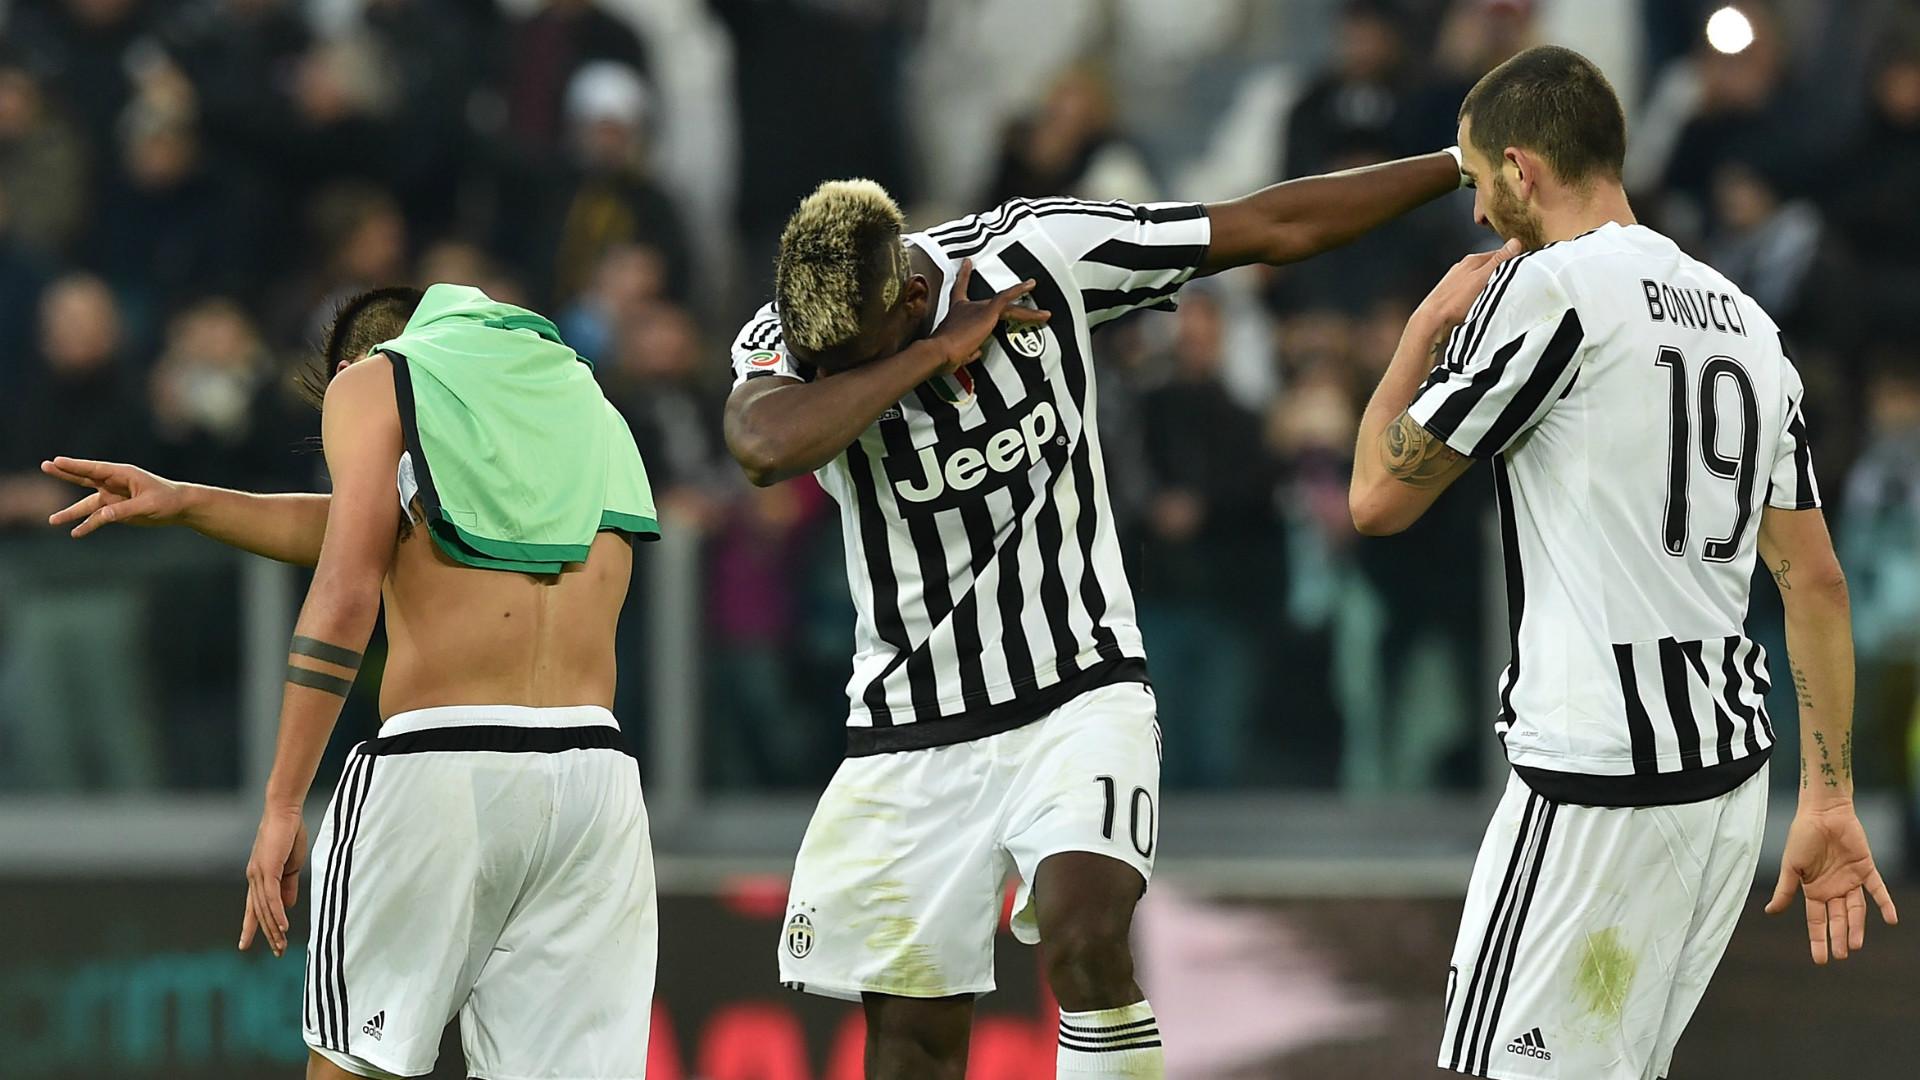 Juventus went on to win the game 3-0, with Leonardo Bonucci and Simone